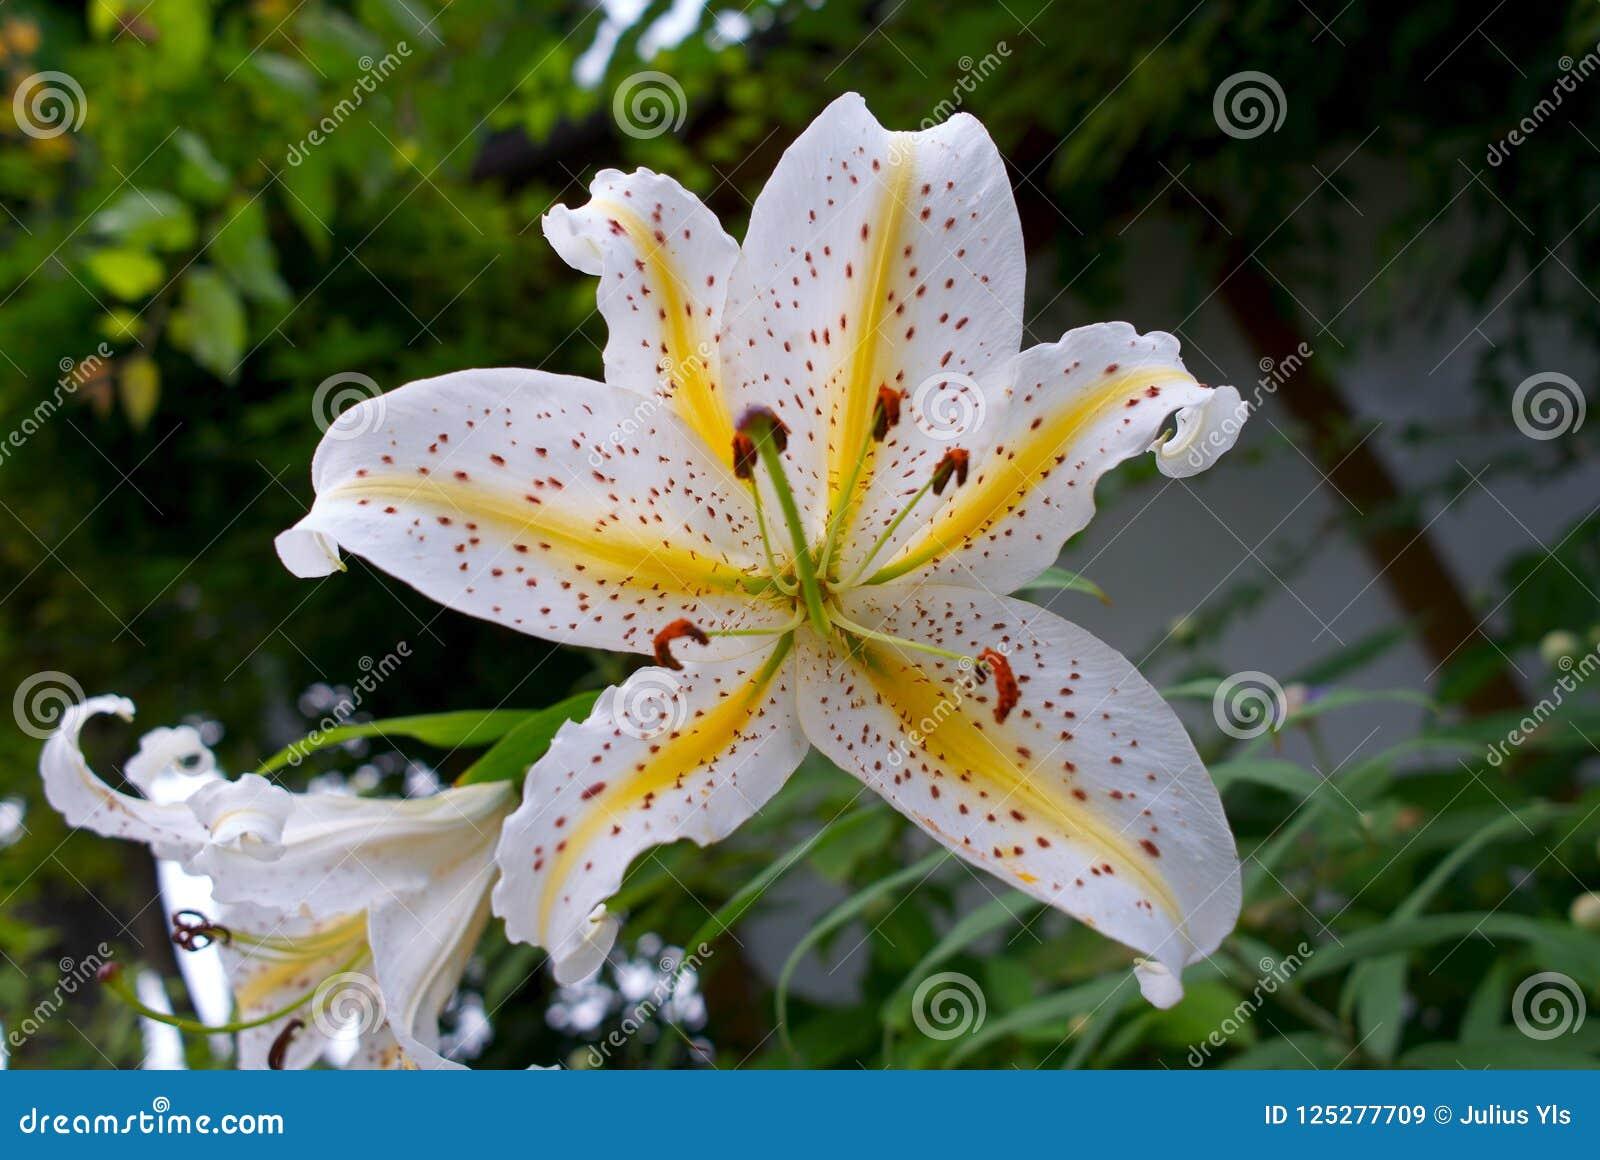 Tiger Lily Flower In Japan Stock Illustration Illustration Of